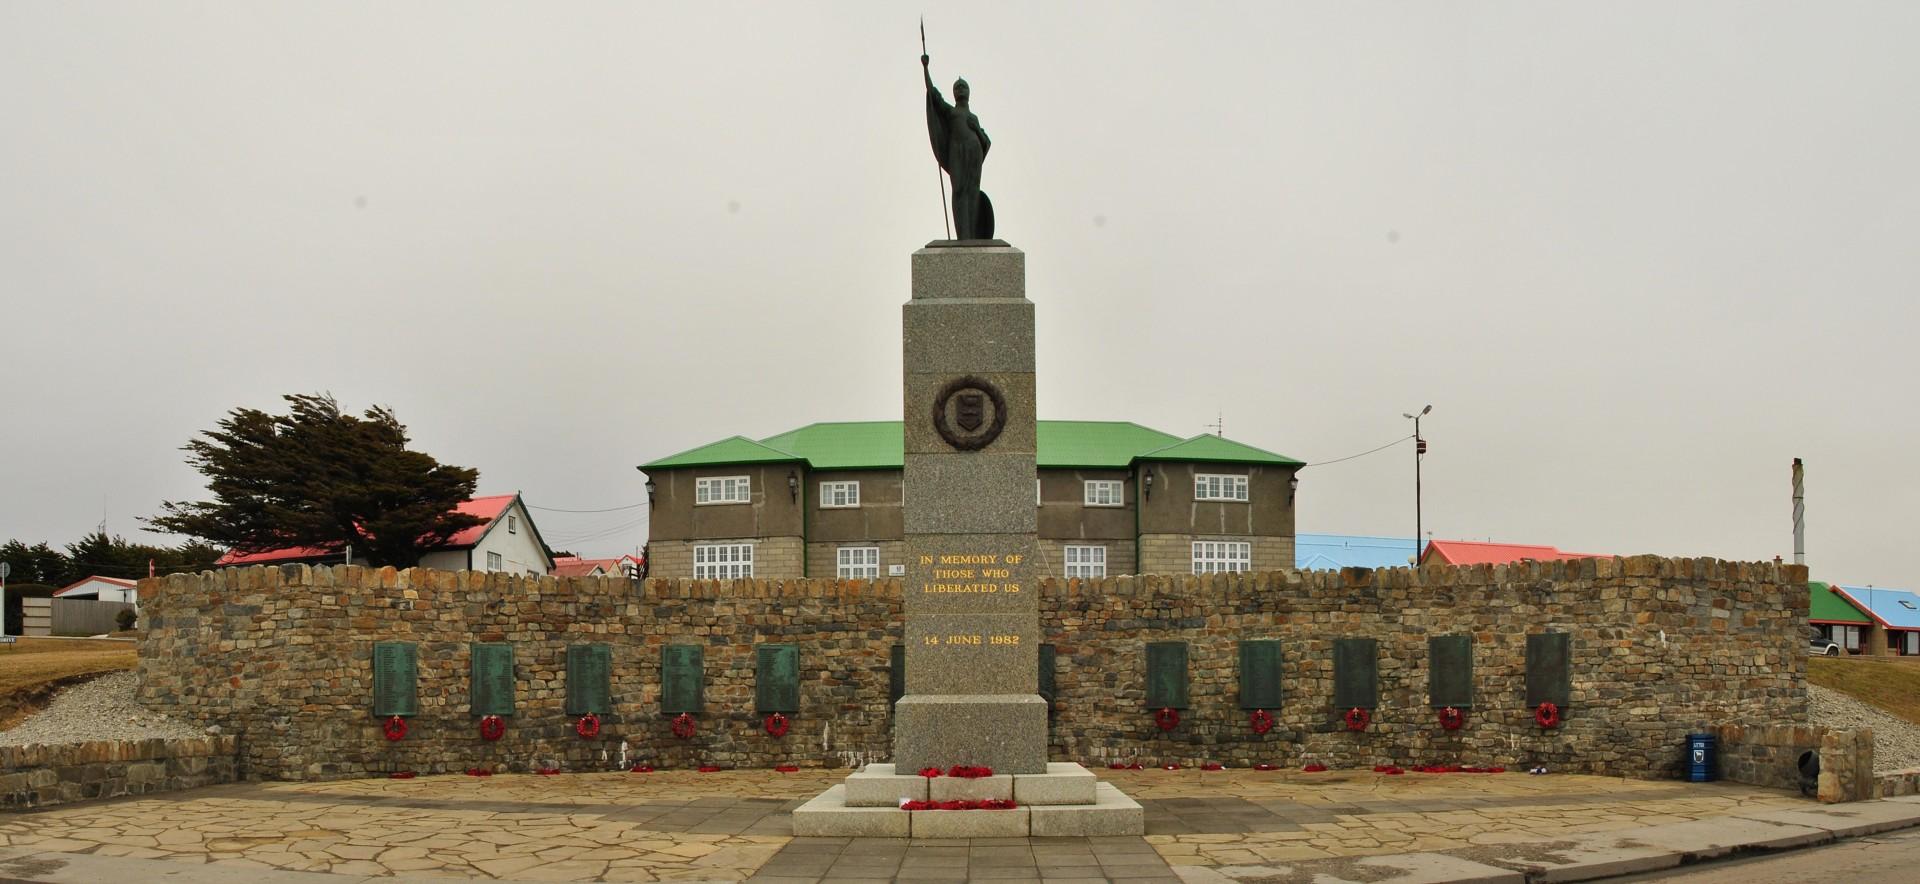 The Falklands War Memorial in Stanley Falkland Islands